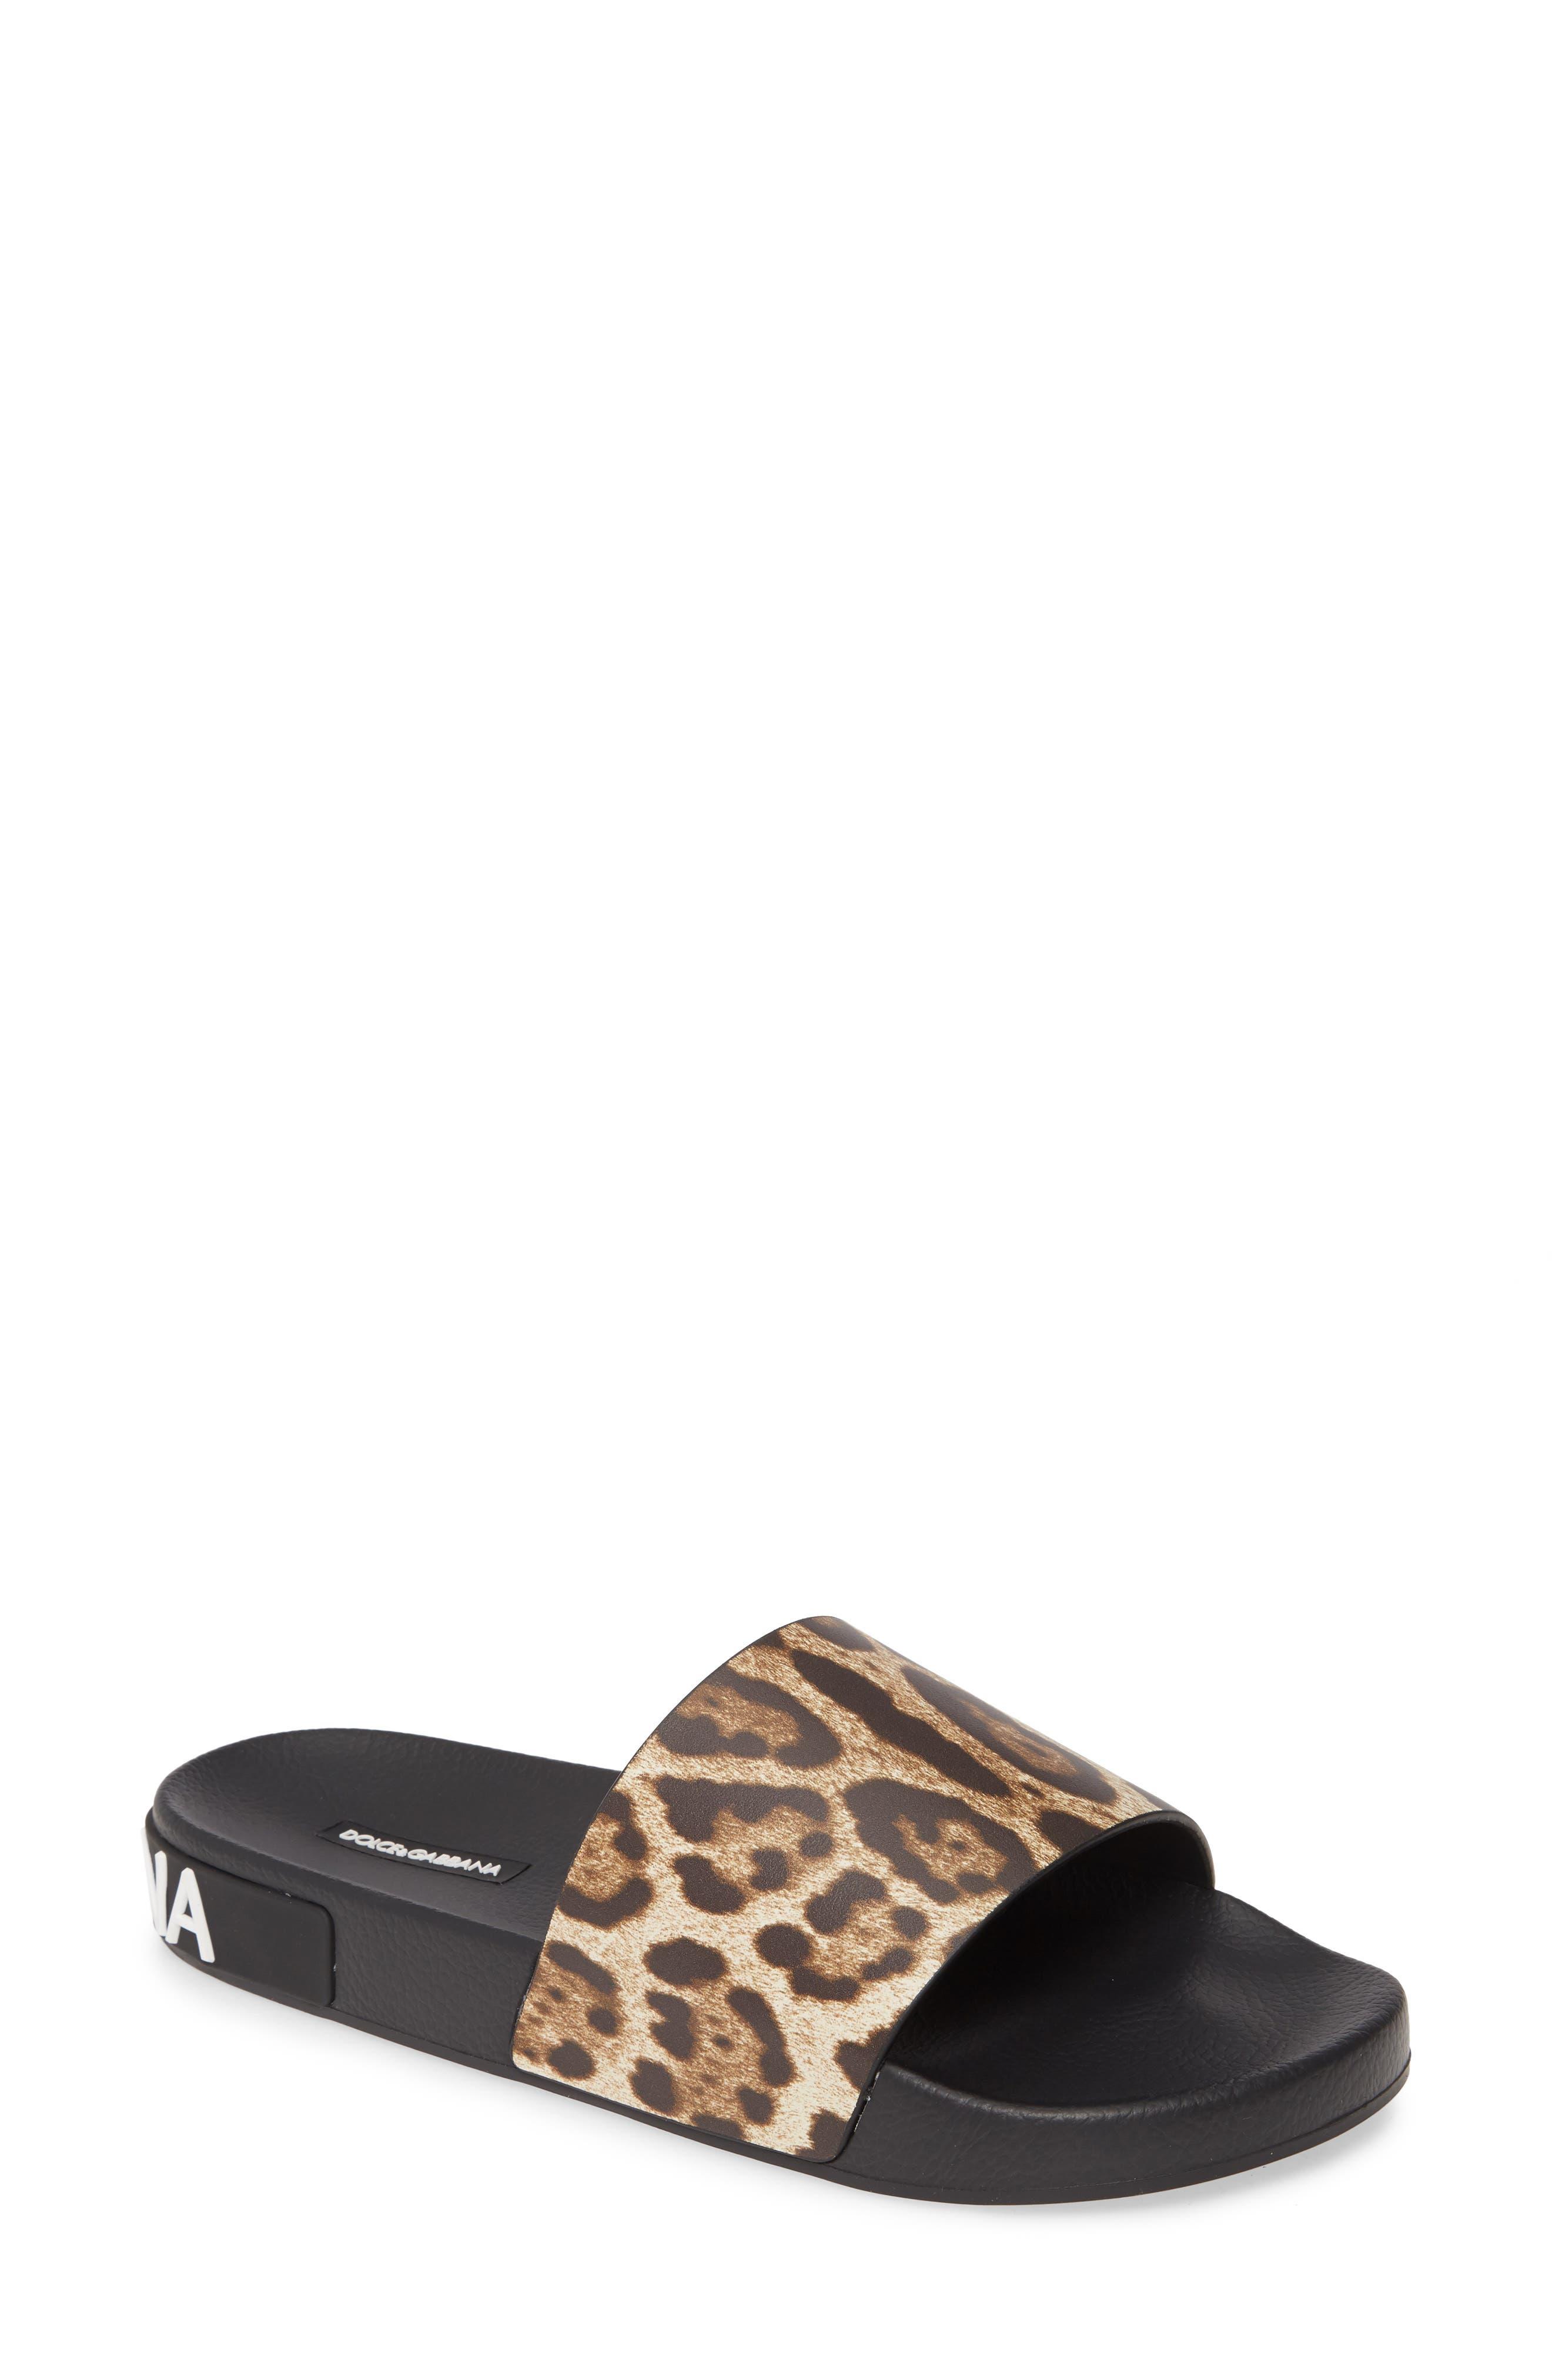 Dolce&Gabbana Saint Barth Leopard Print ZLogo Slide Sandal (Women)